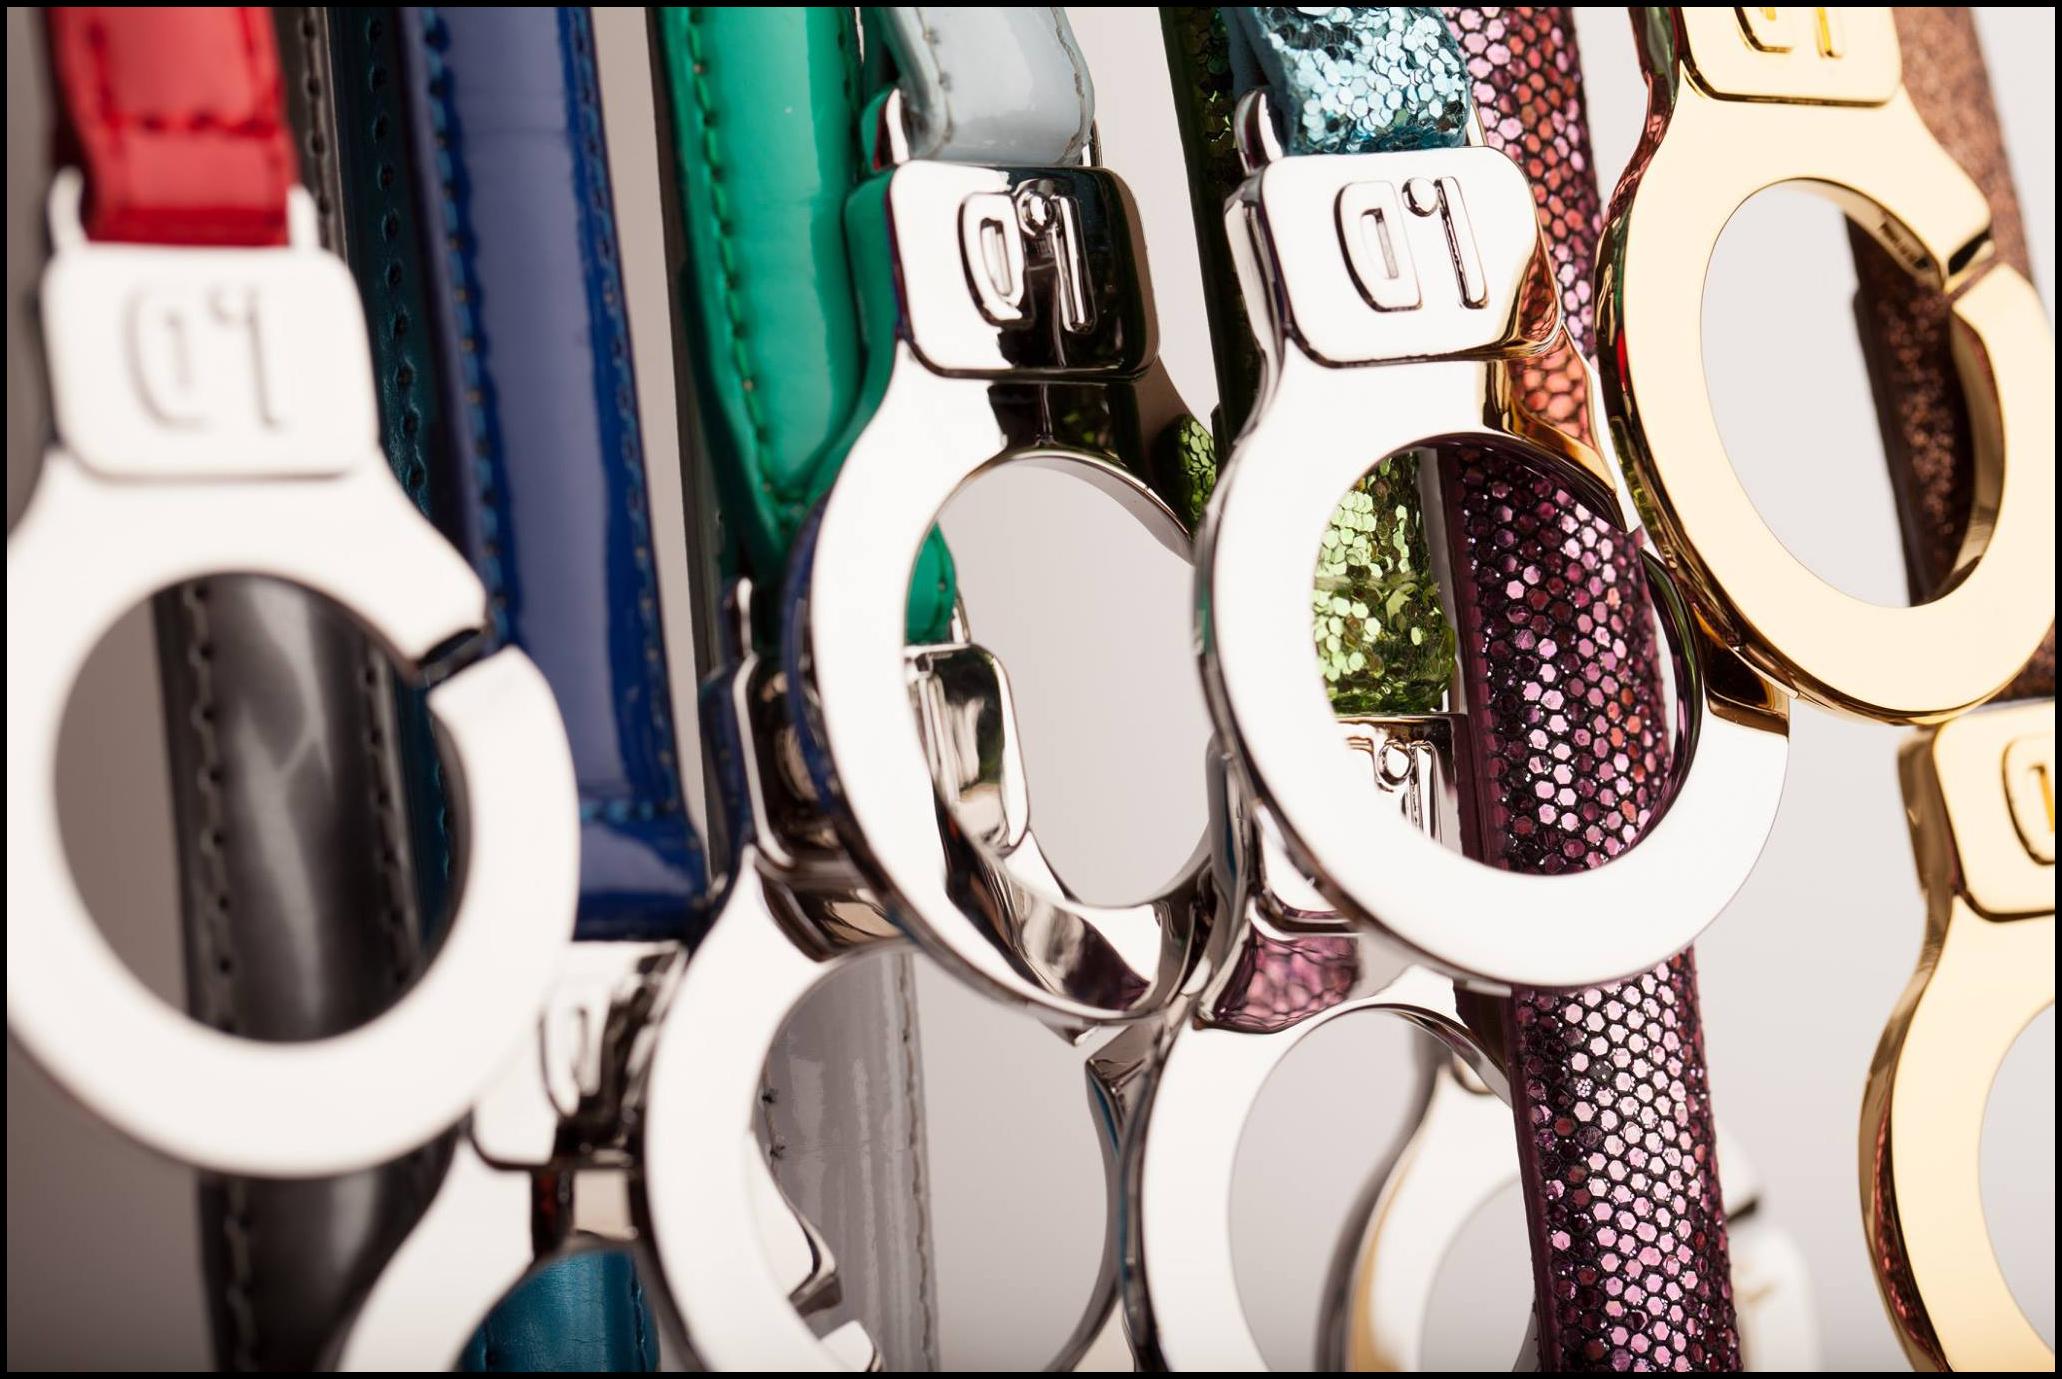 cuffs-of-love-belts.jpg